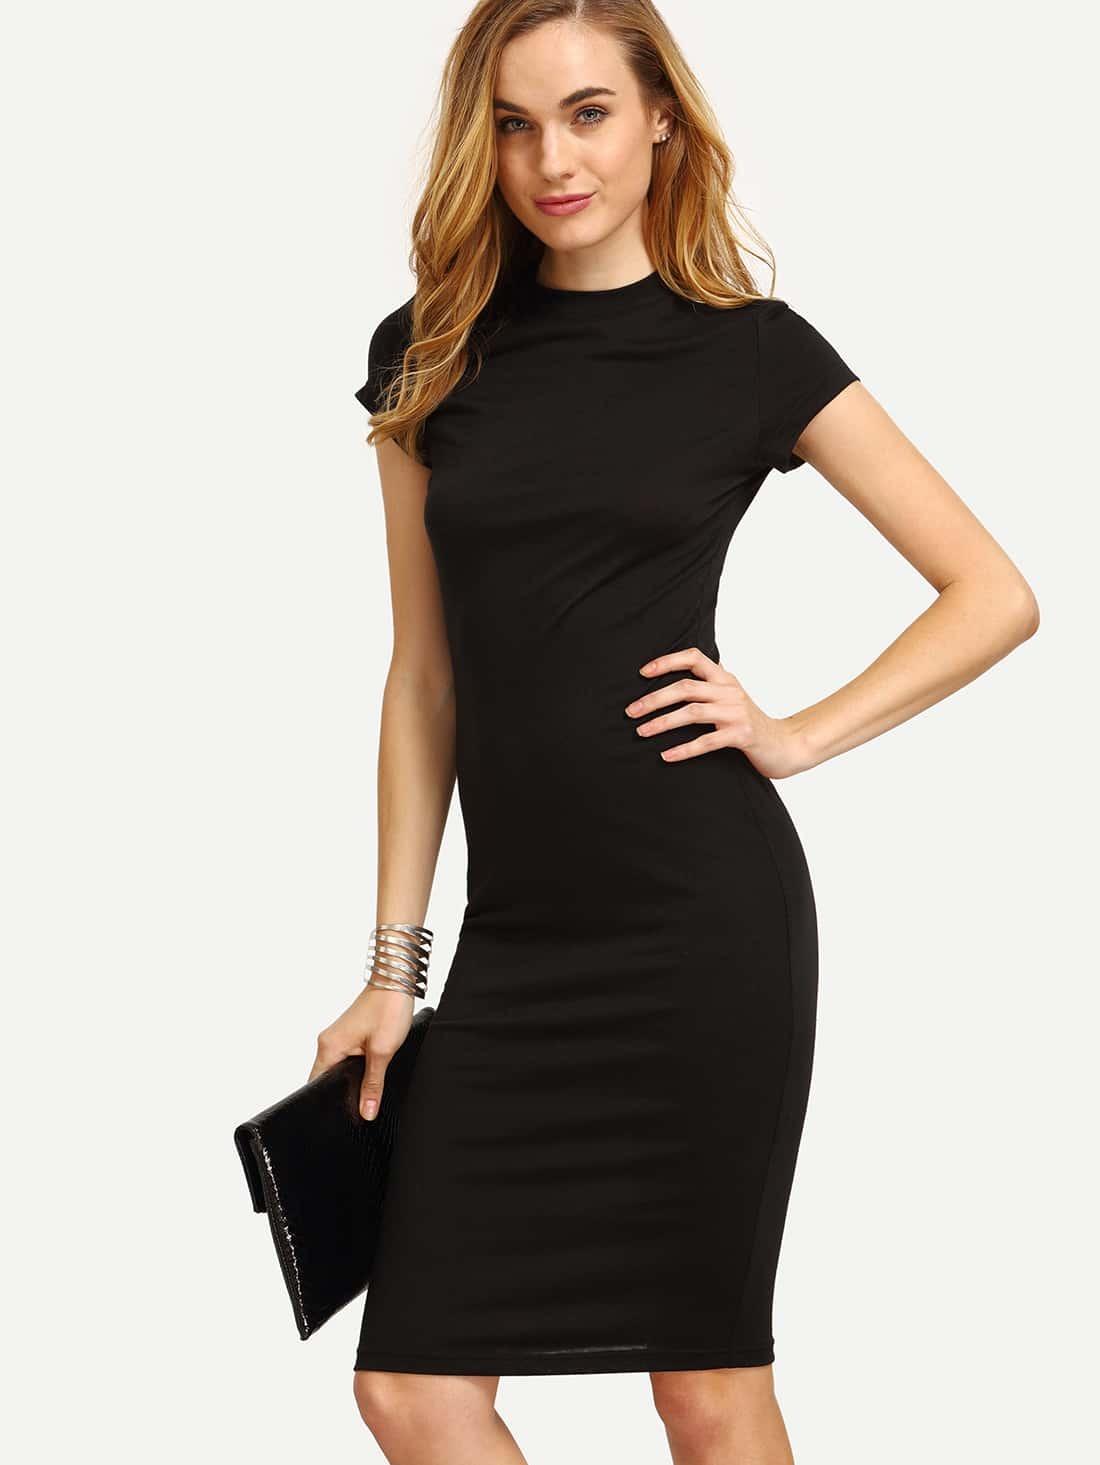 Black Cap Sleeve Crew Neck Sheath Dress EmmaCloth-Women Fast Fashion ... a1e05d5d8a7b